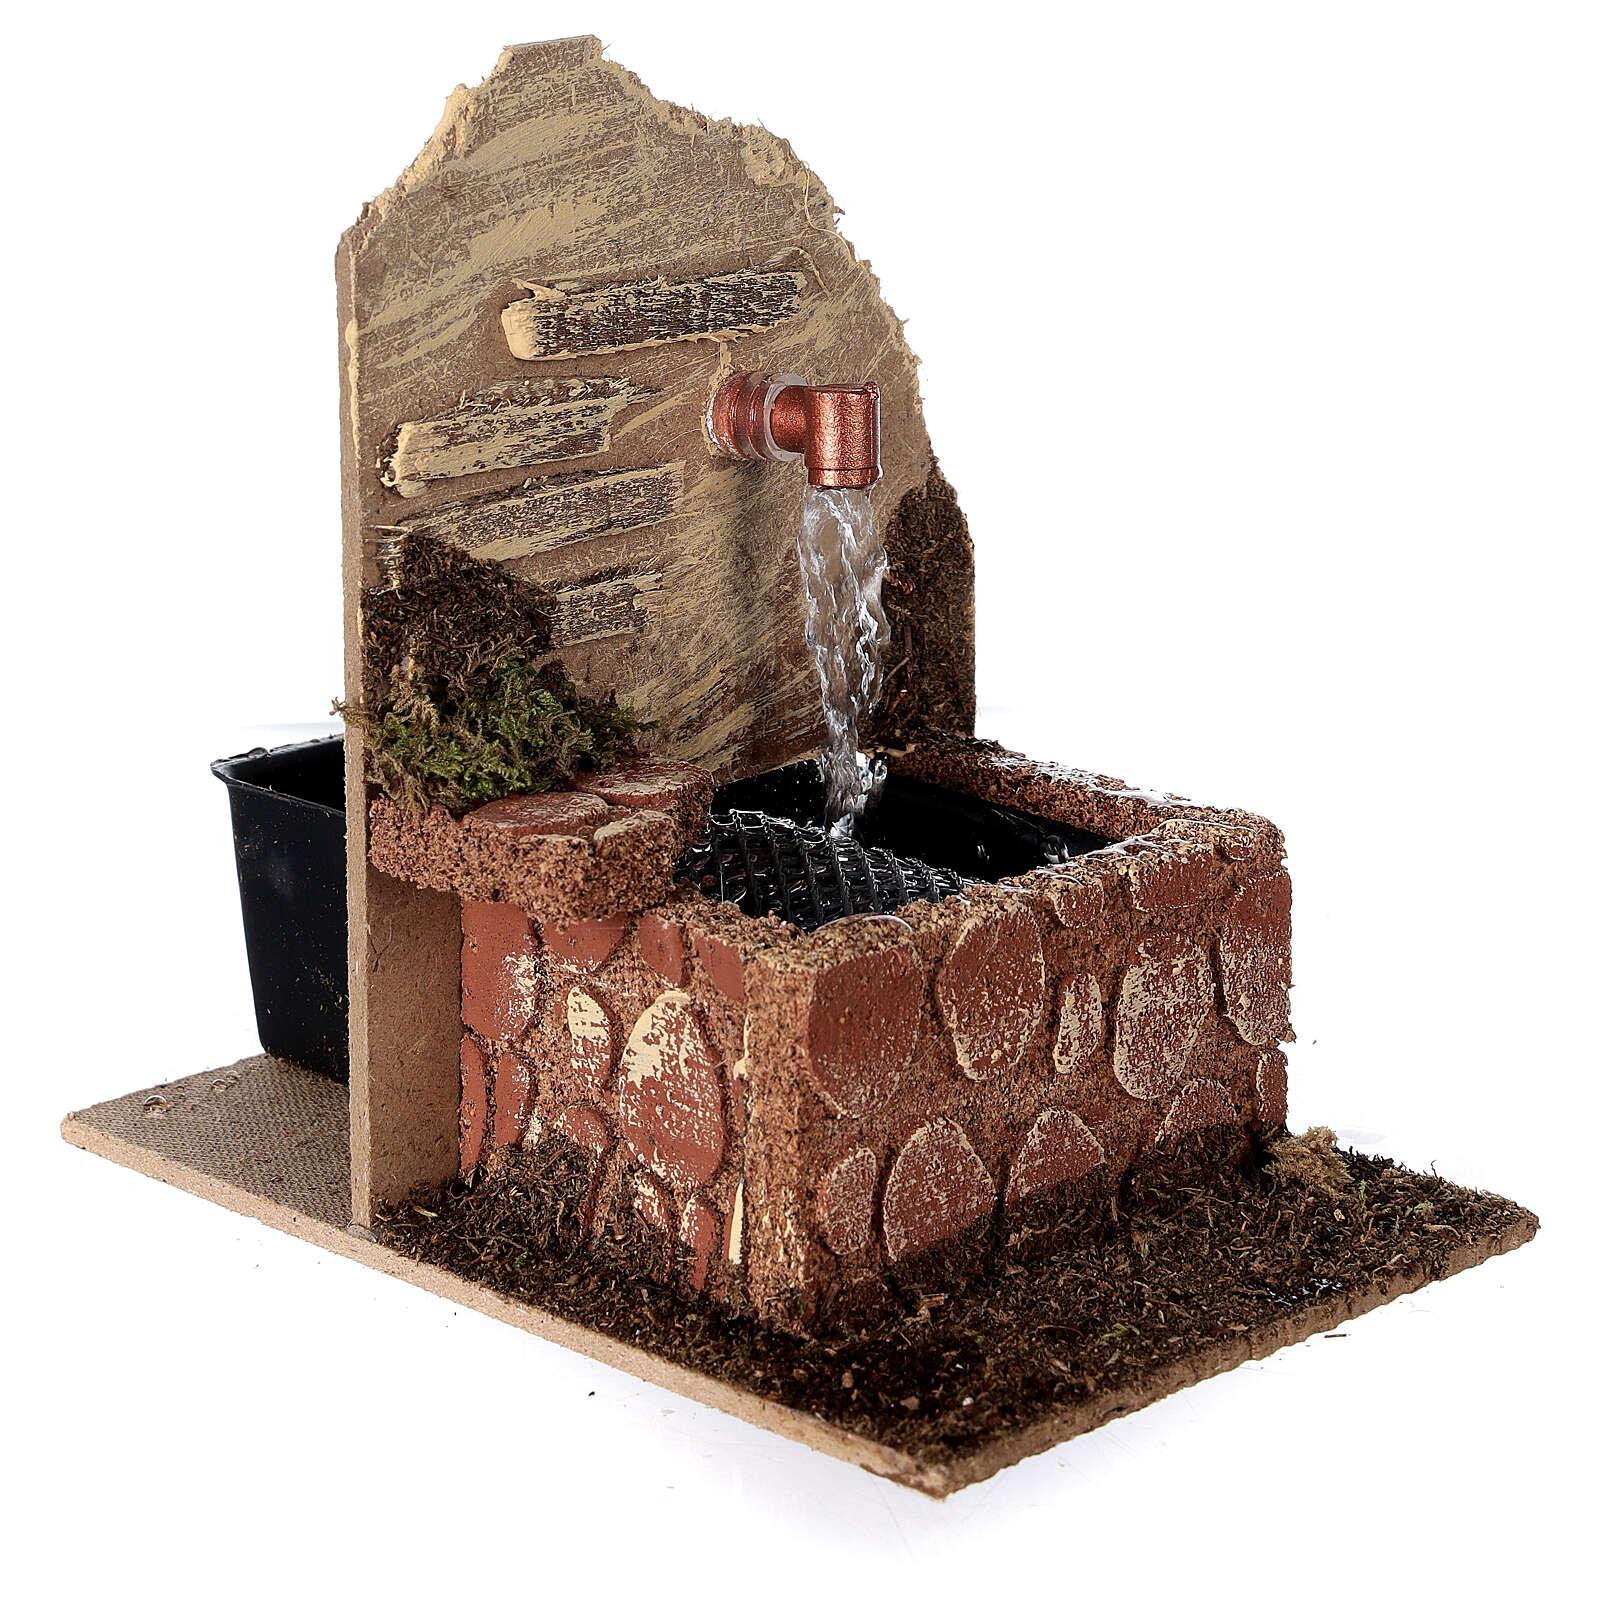 Fontana con vasca con pompa 15x10x15 cm presepe 10-12 cm 4